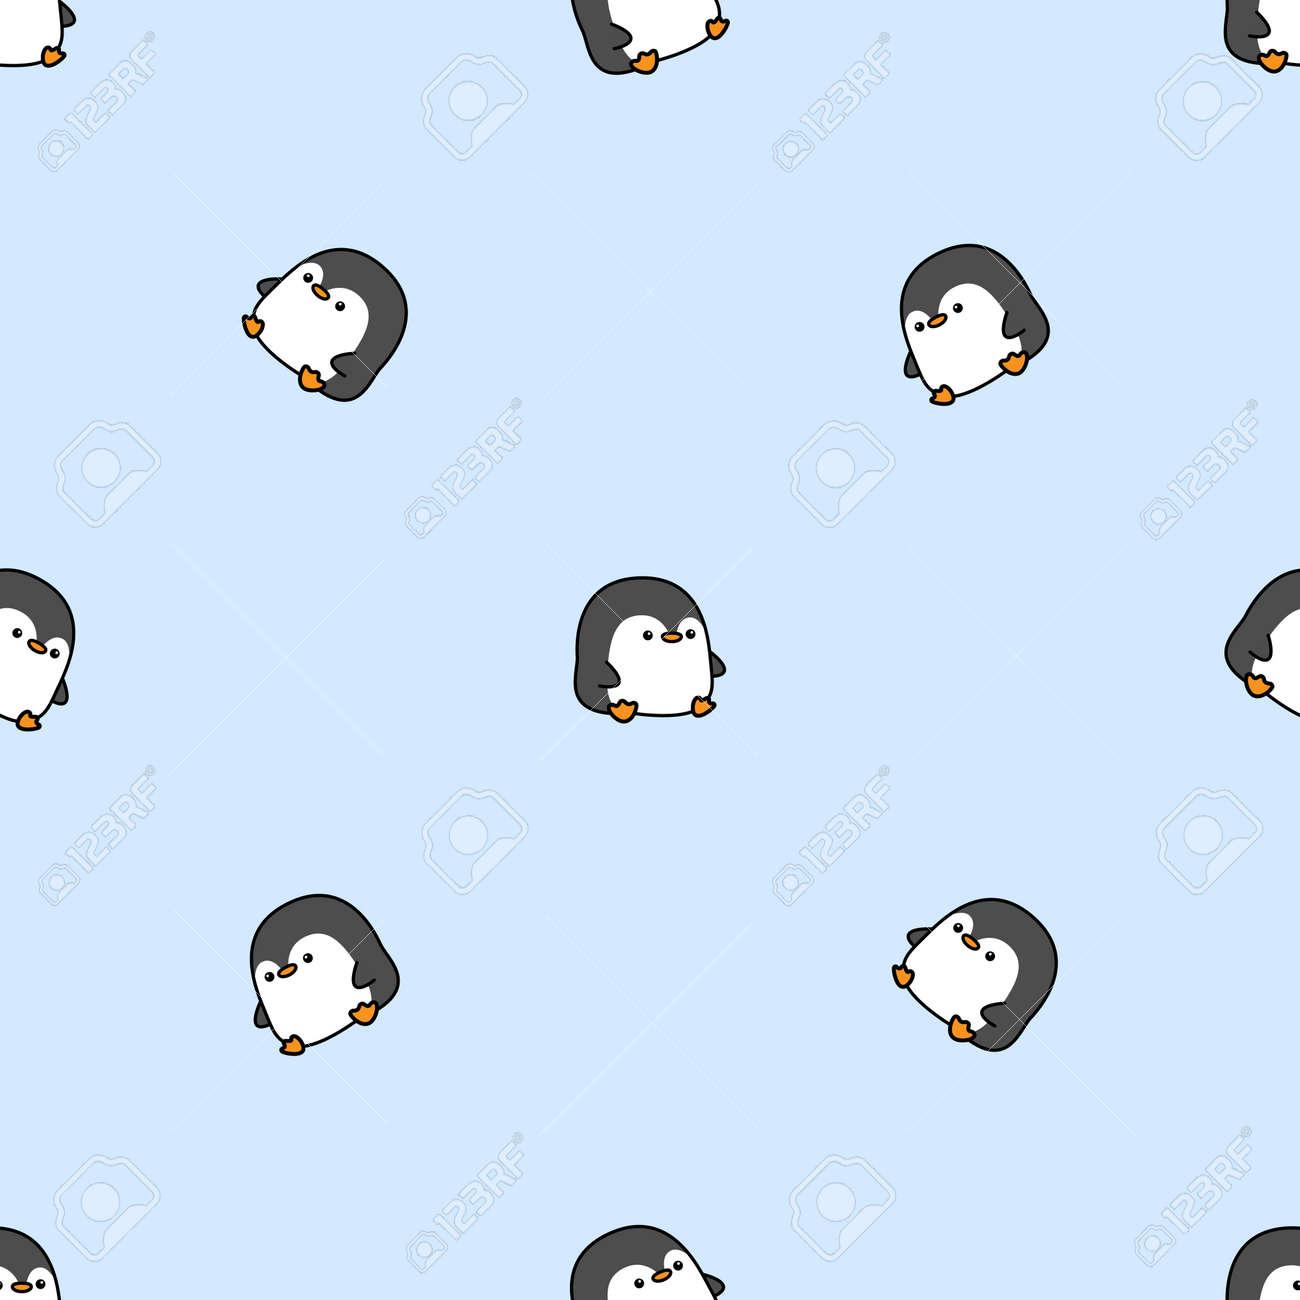 Cute fat penguin cartoon seamless pattern, vector illustration - 169151617